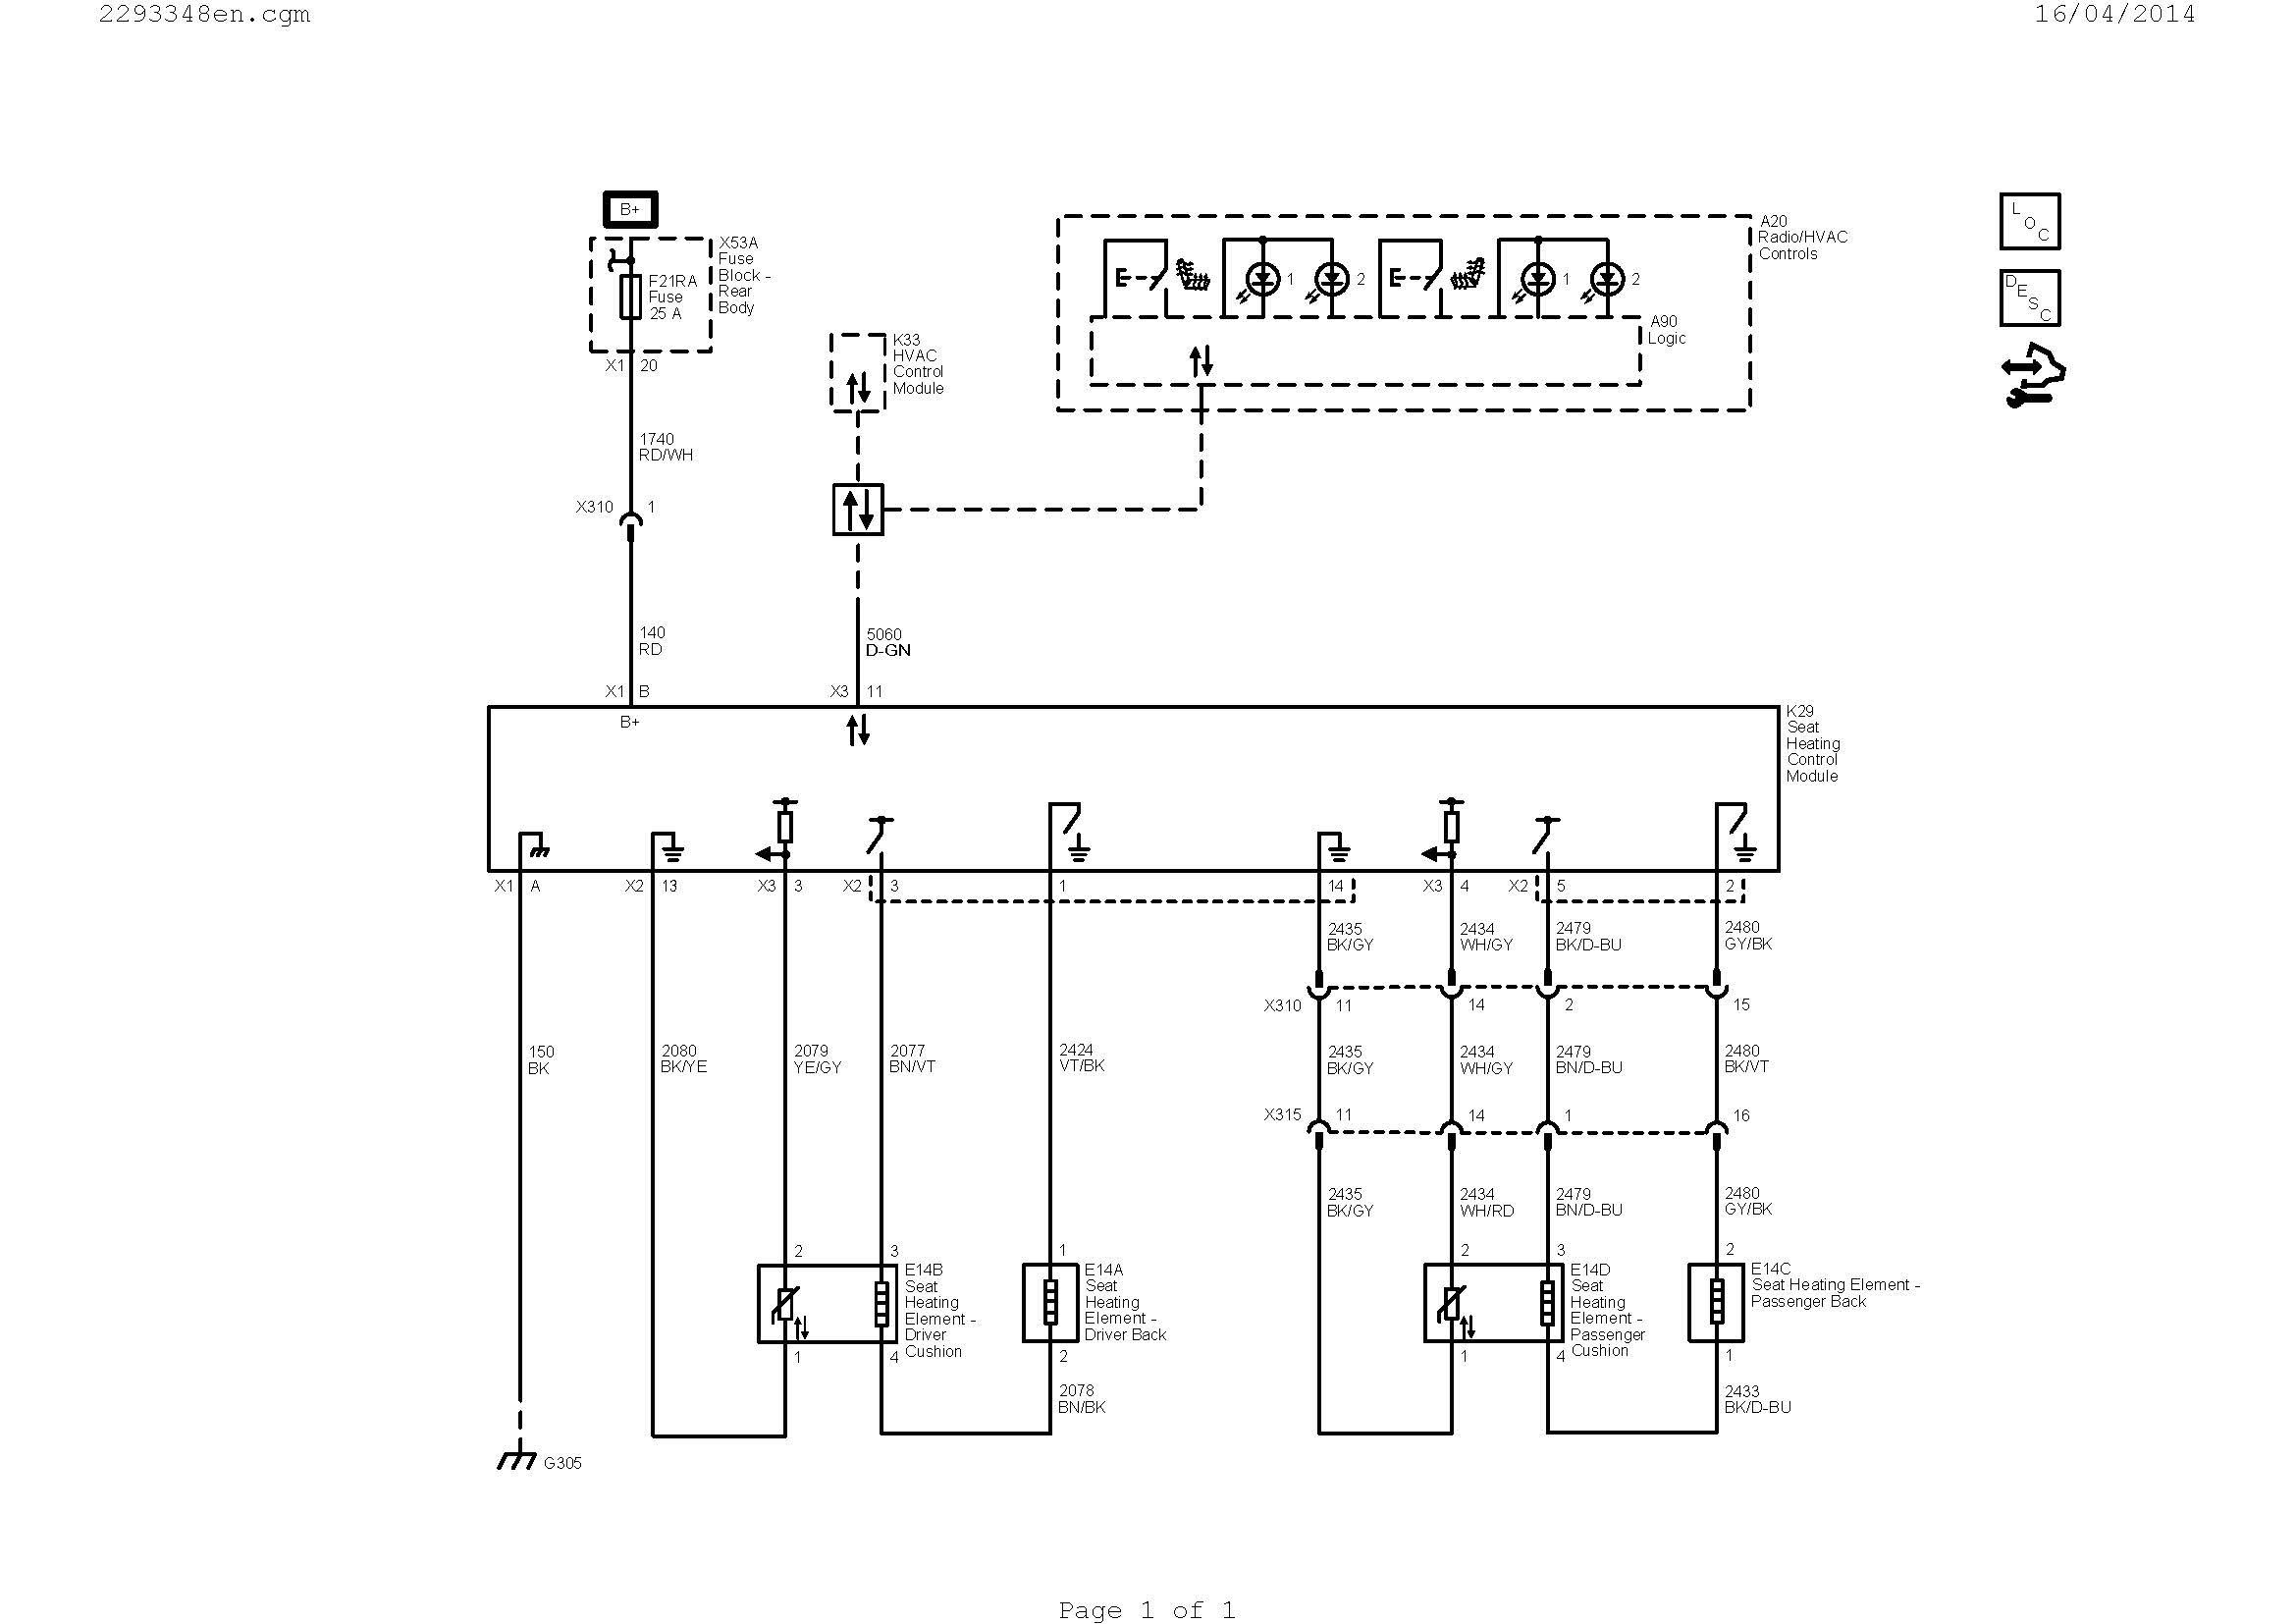 hvac wiring diagram Download-Wiring Diagram Schematic New Wiring Diagram Guitar Fresh Hvac Diagram Best Hvac Diagram 0d 5-c